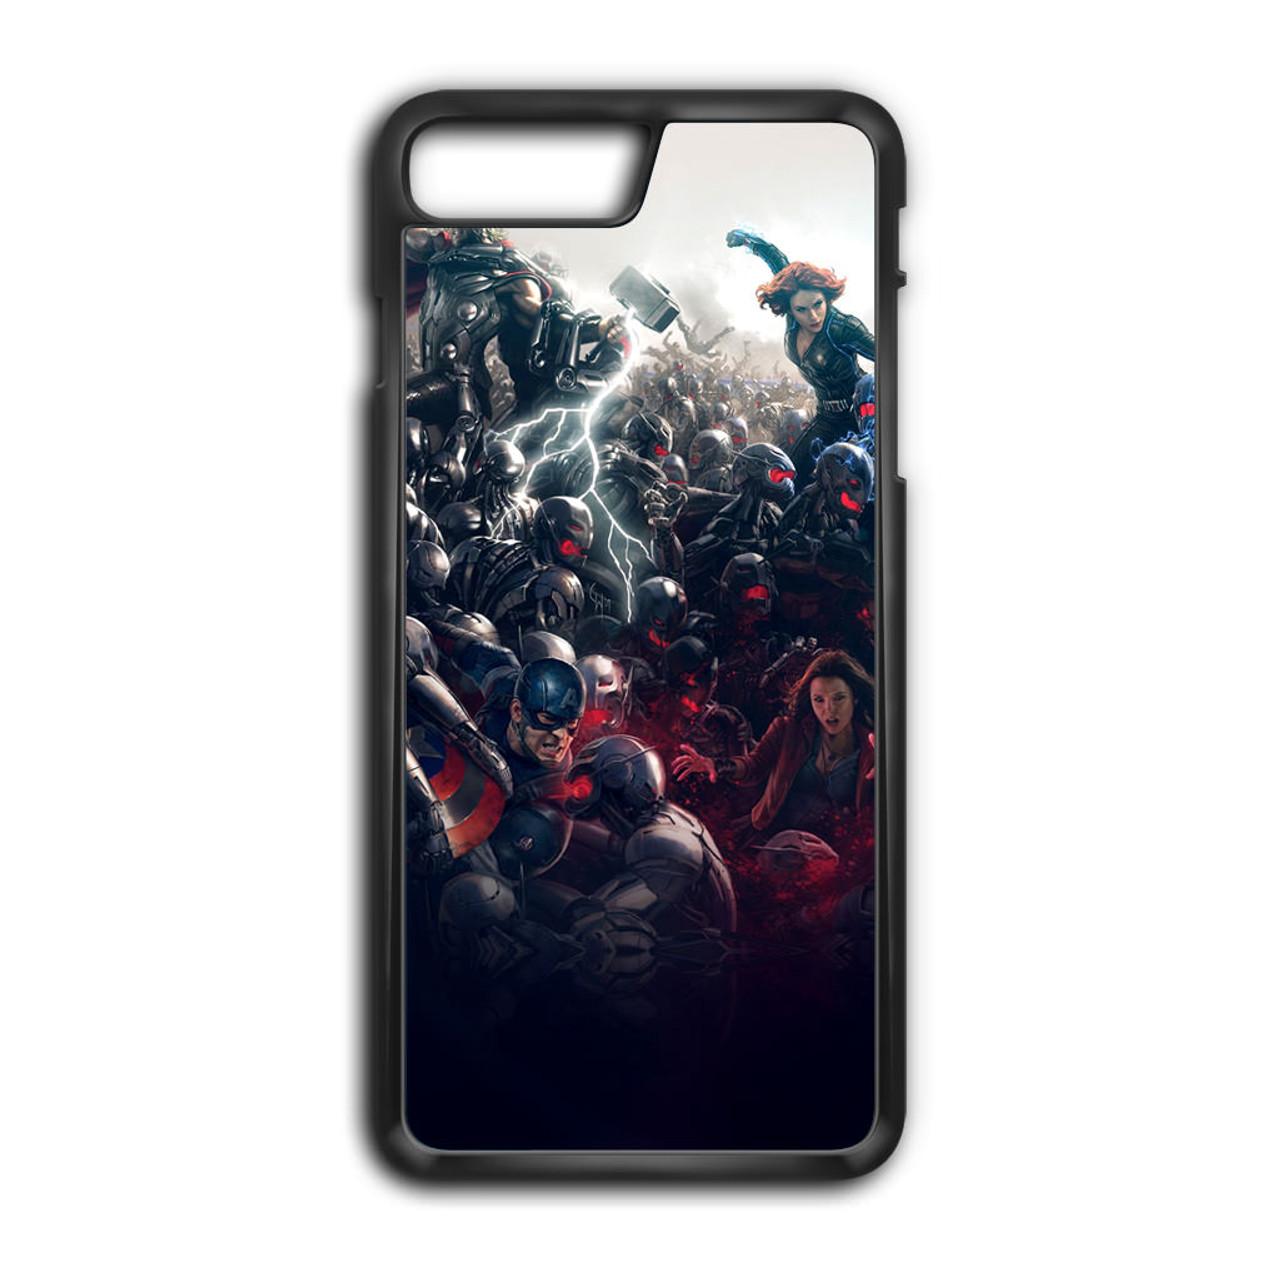 iphone 8 case avengers